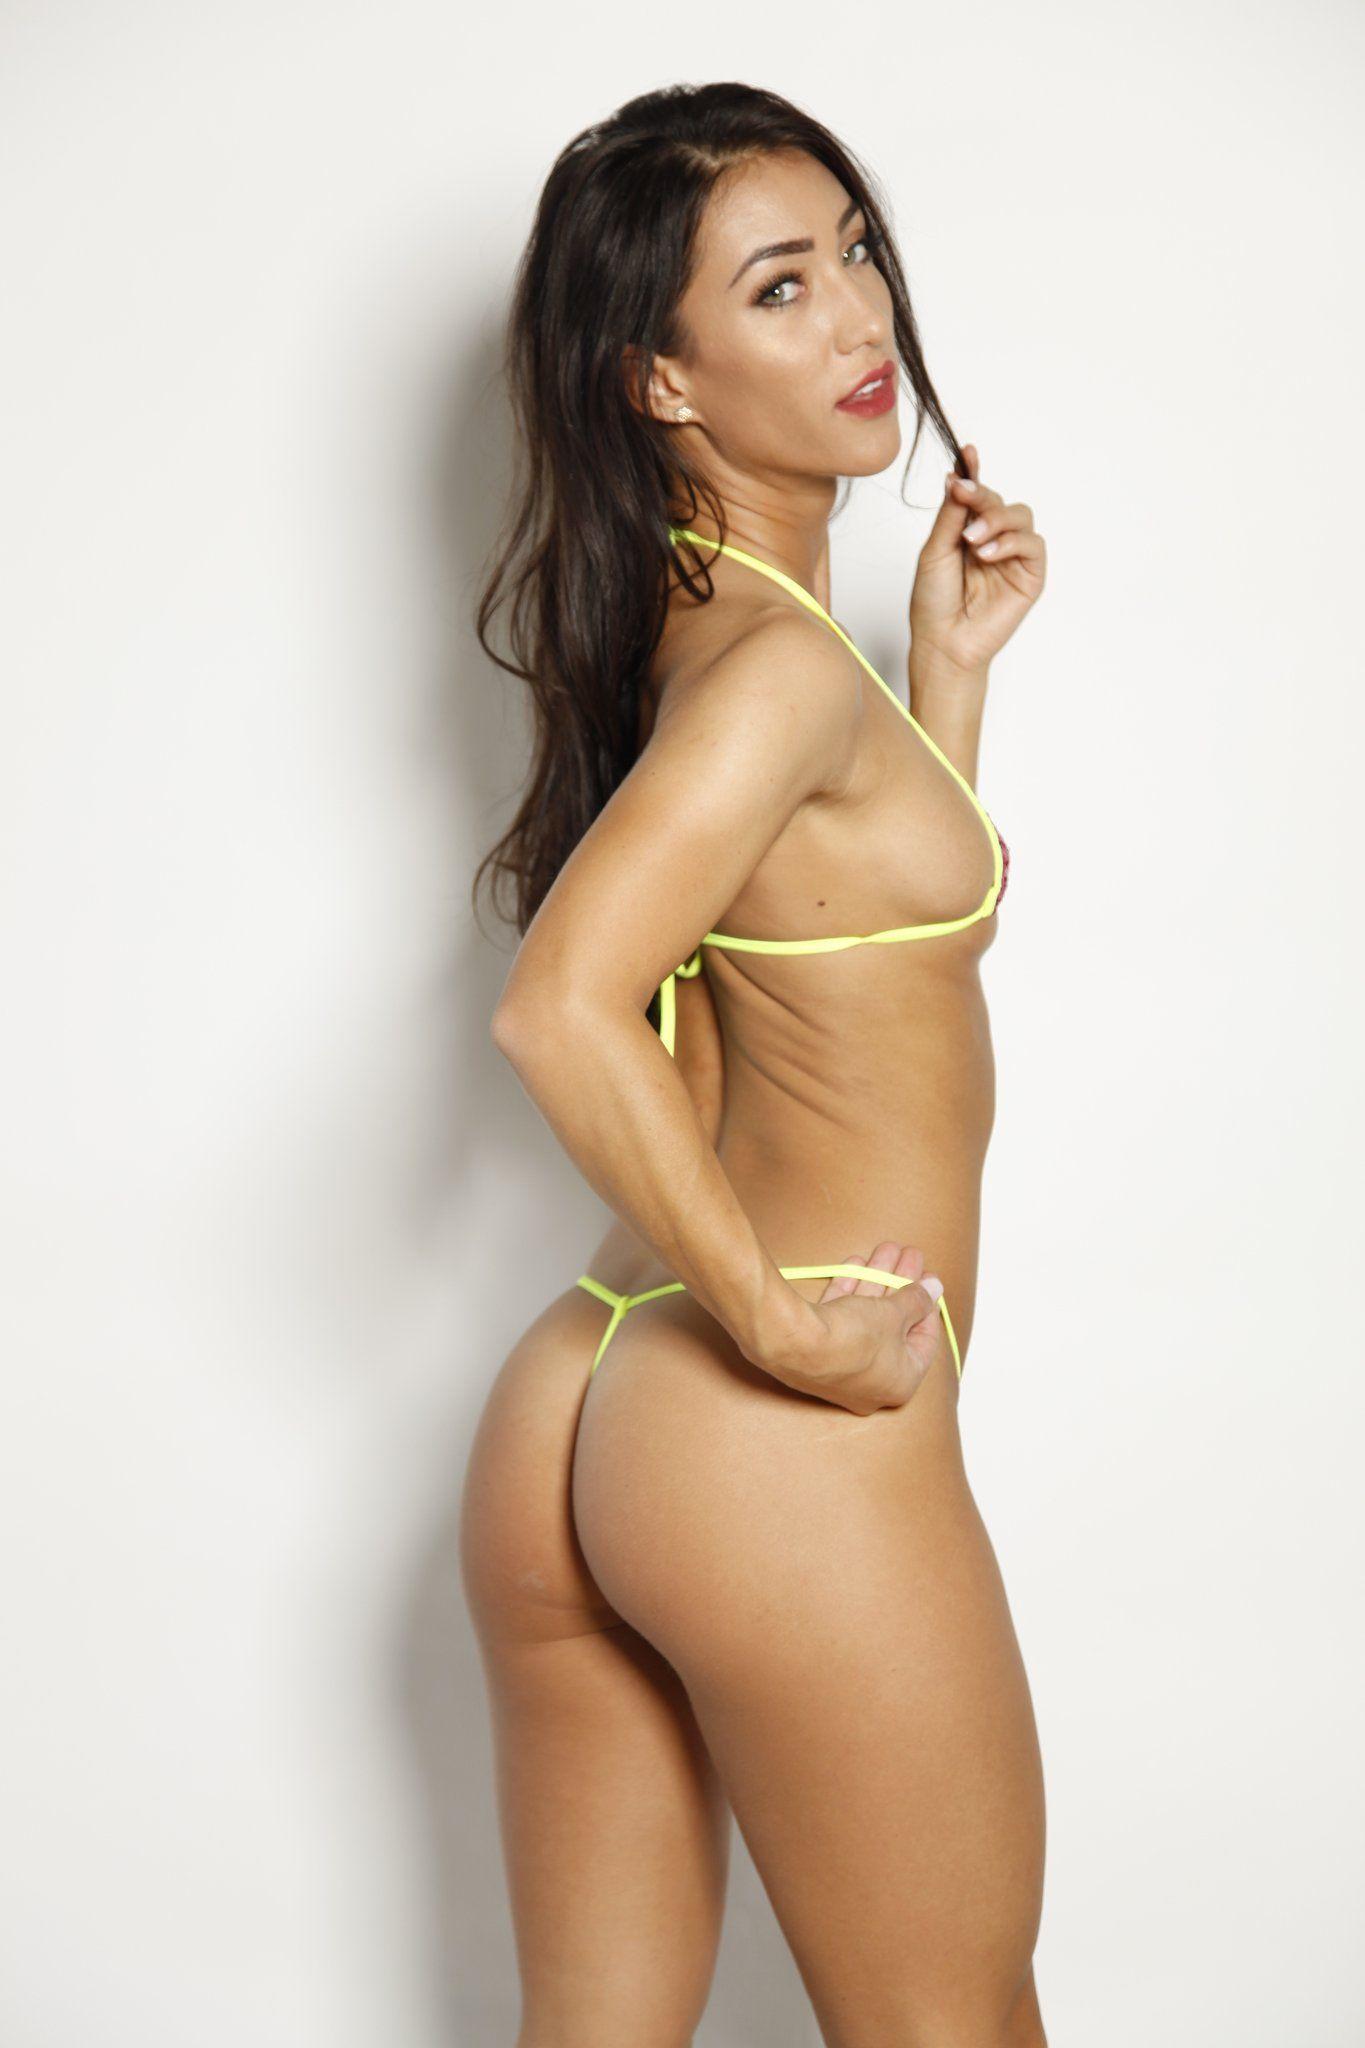 74866a22a Bitsys Bikinis Pink Sequin Yellow String Exotic Euro Style Extreme Micro  Bikini Shop Online